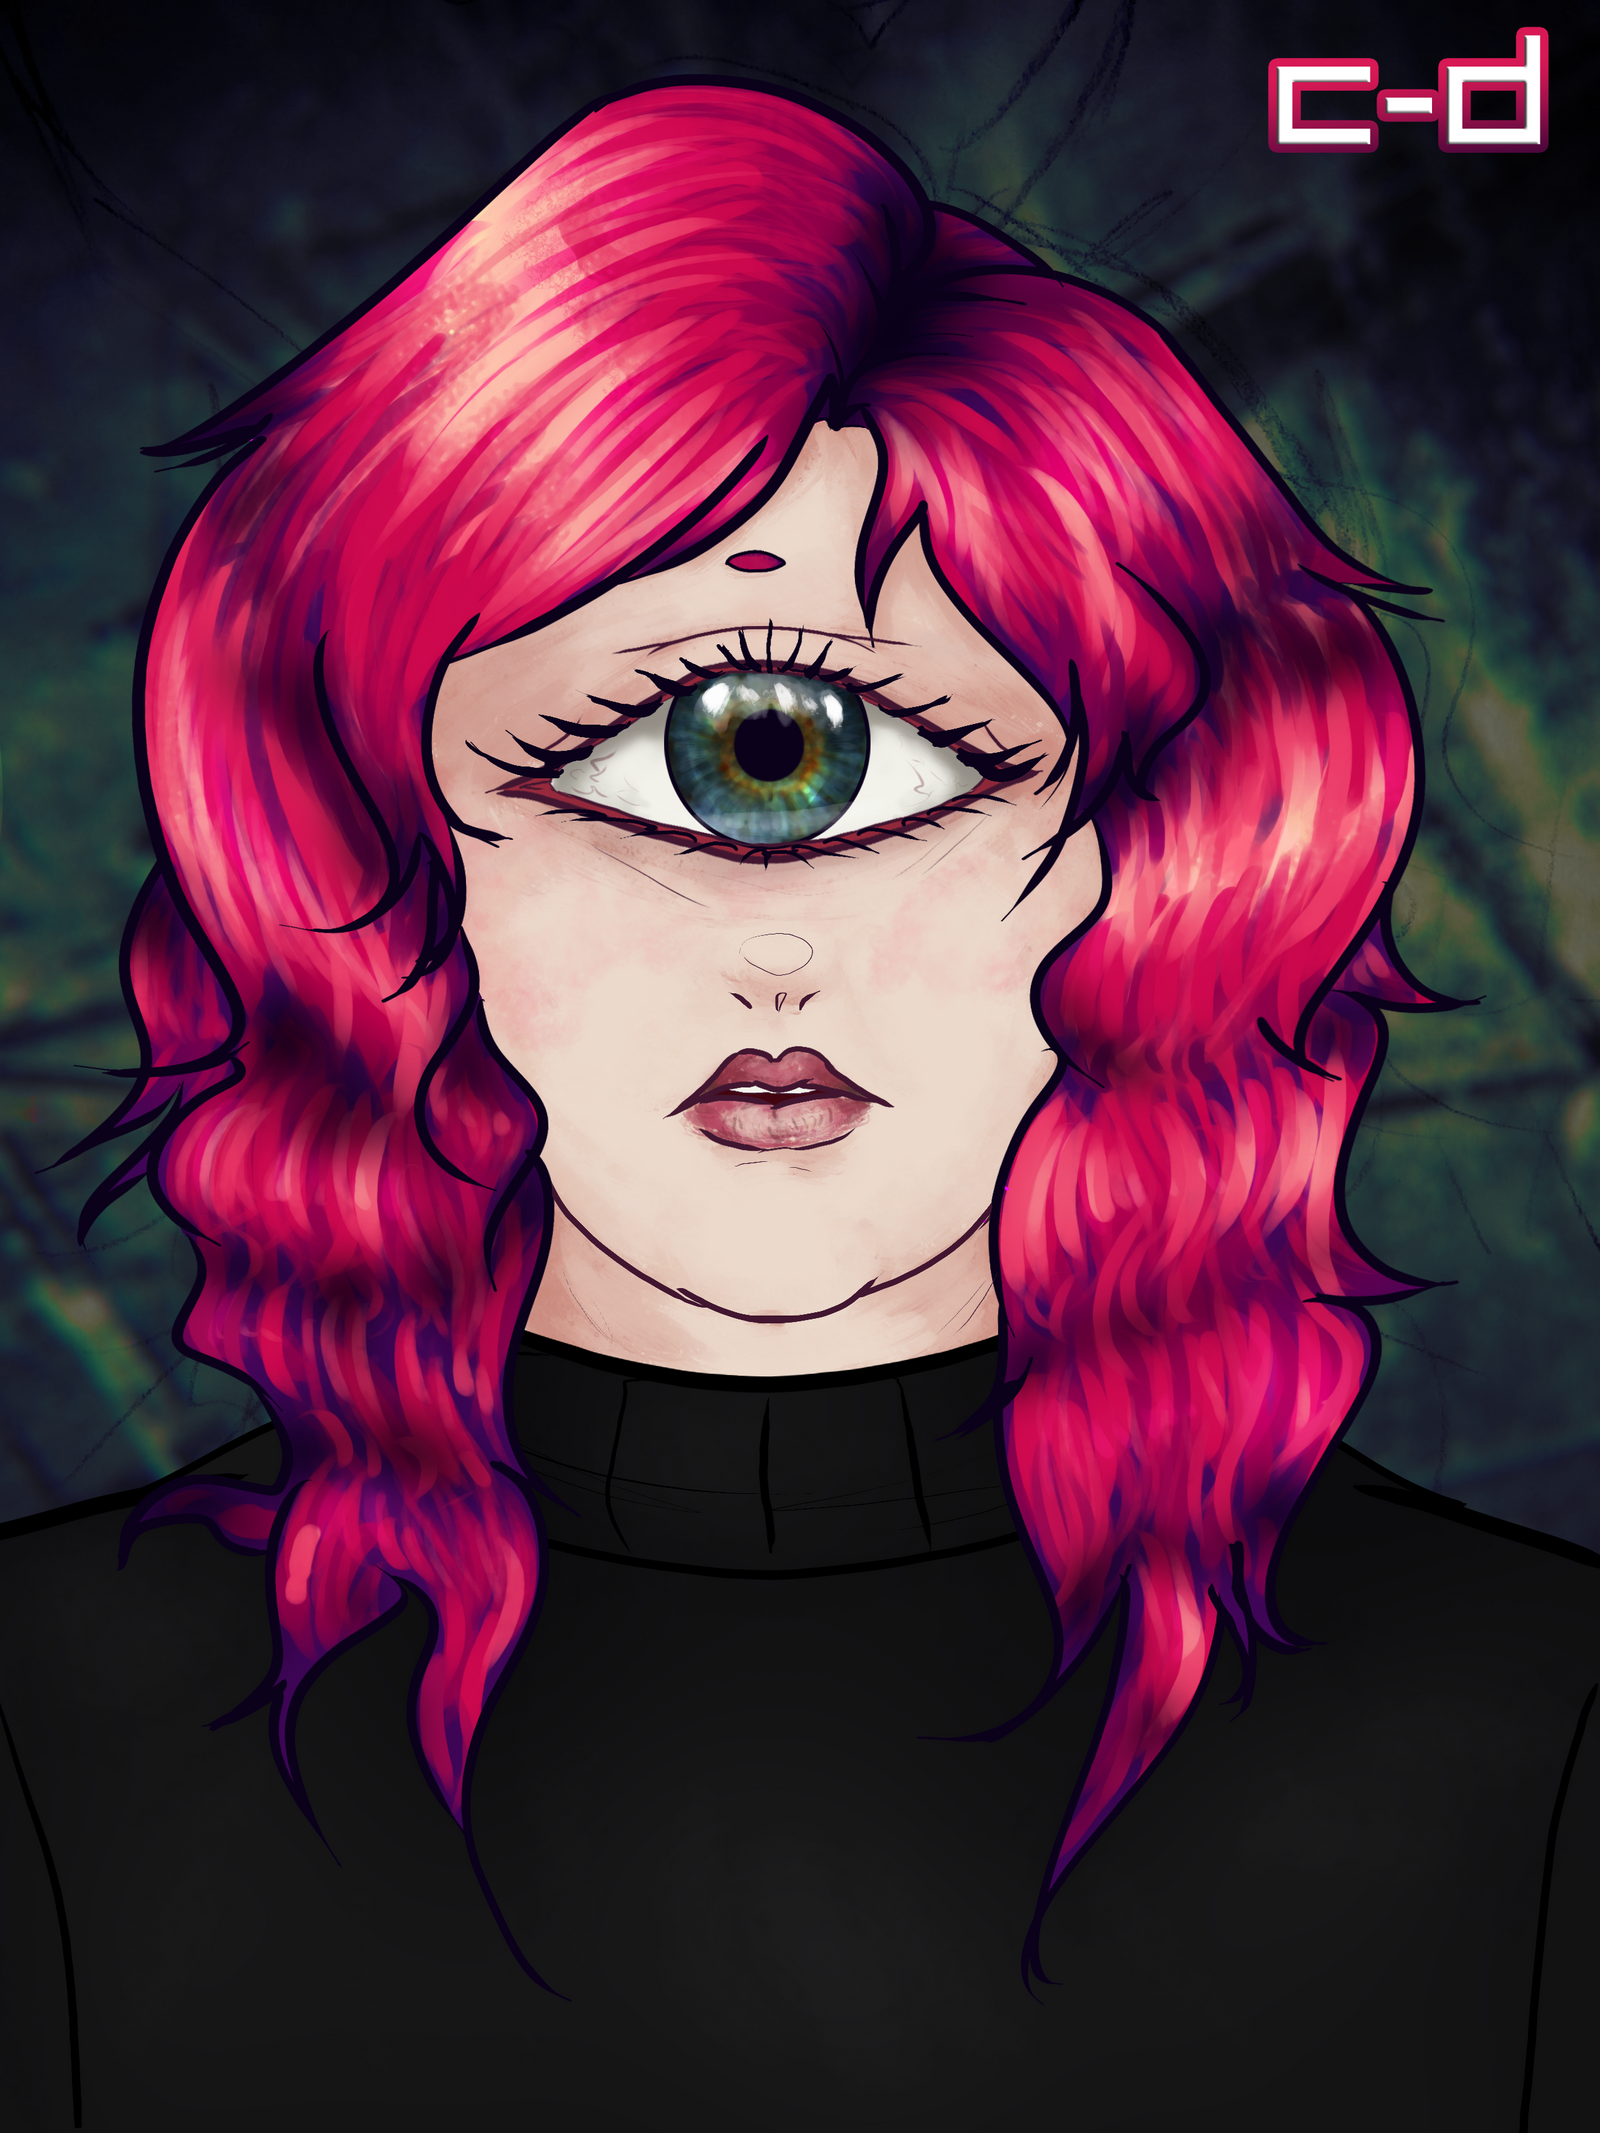 one-eyed wonder by cosmogyral-delirium